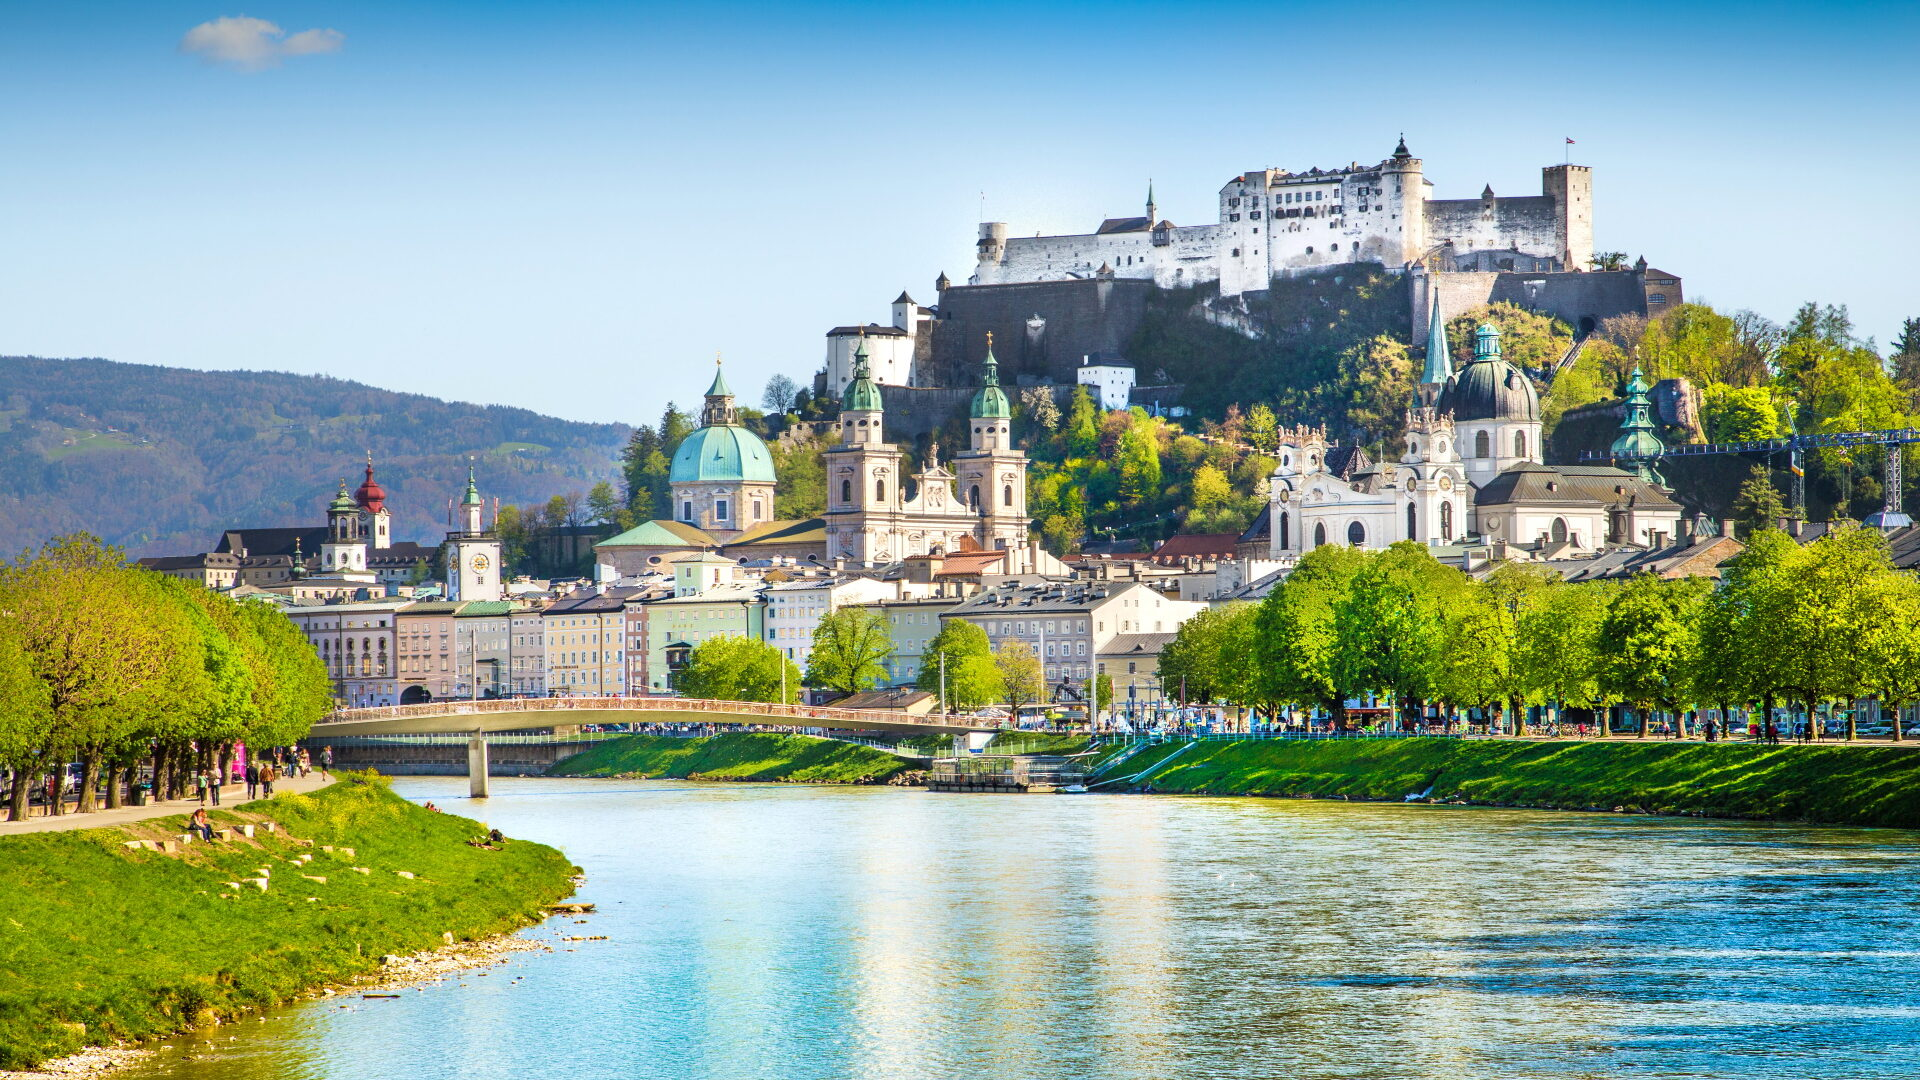 Frankfurt (FRA) – Salzburg (SZG)